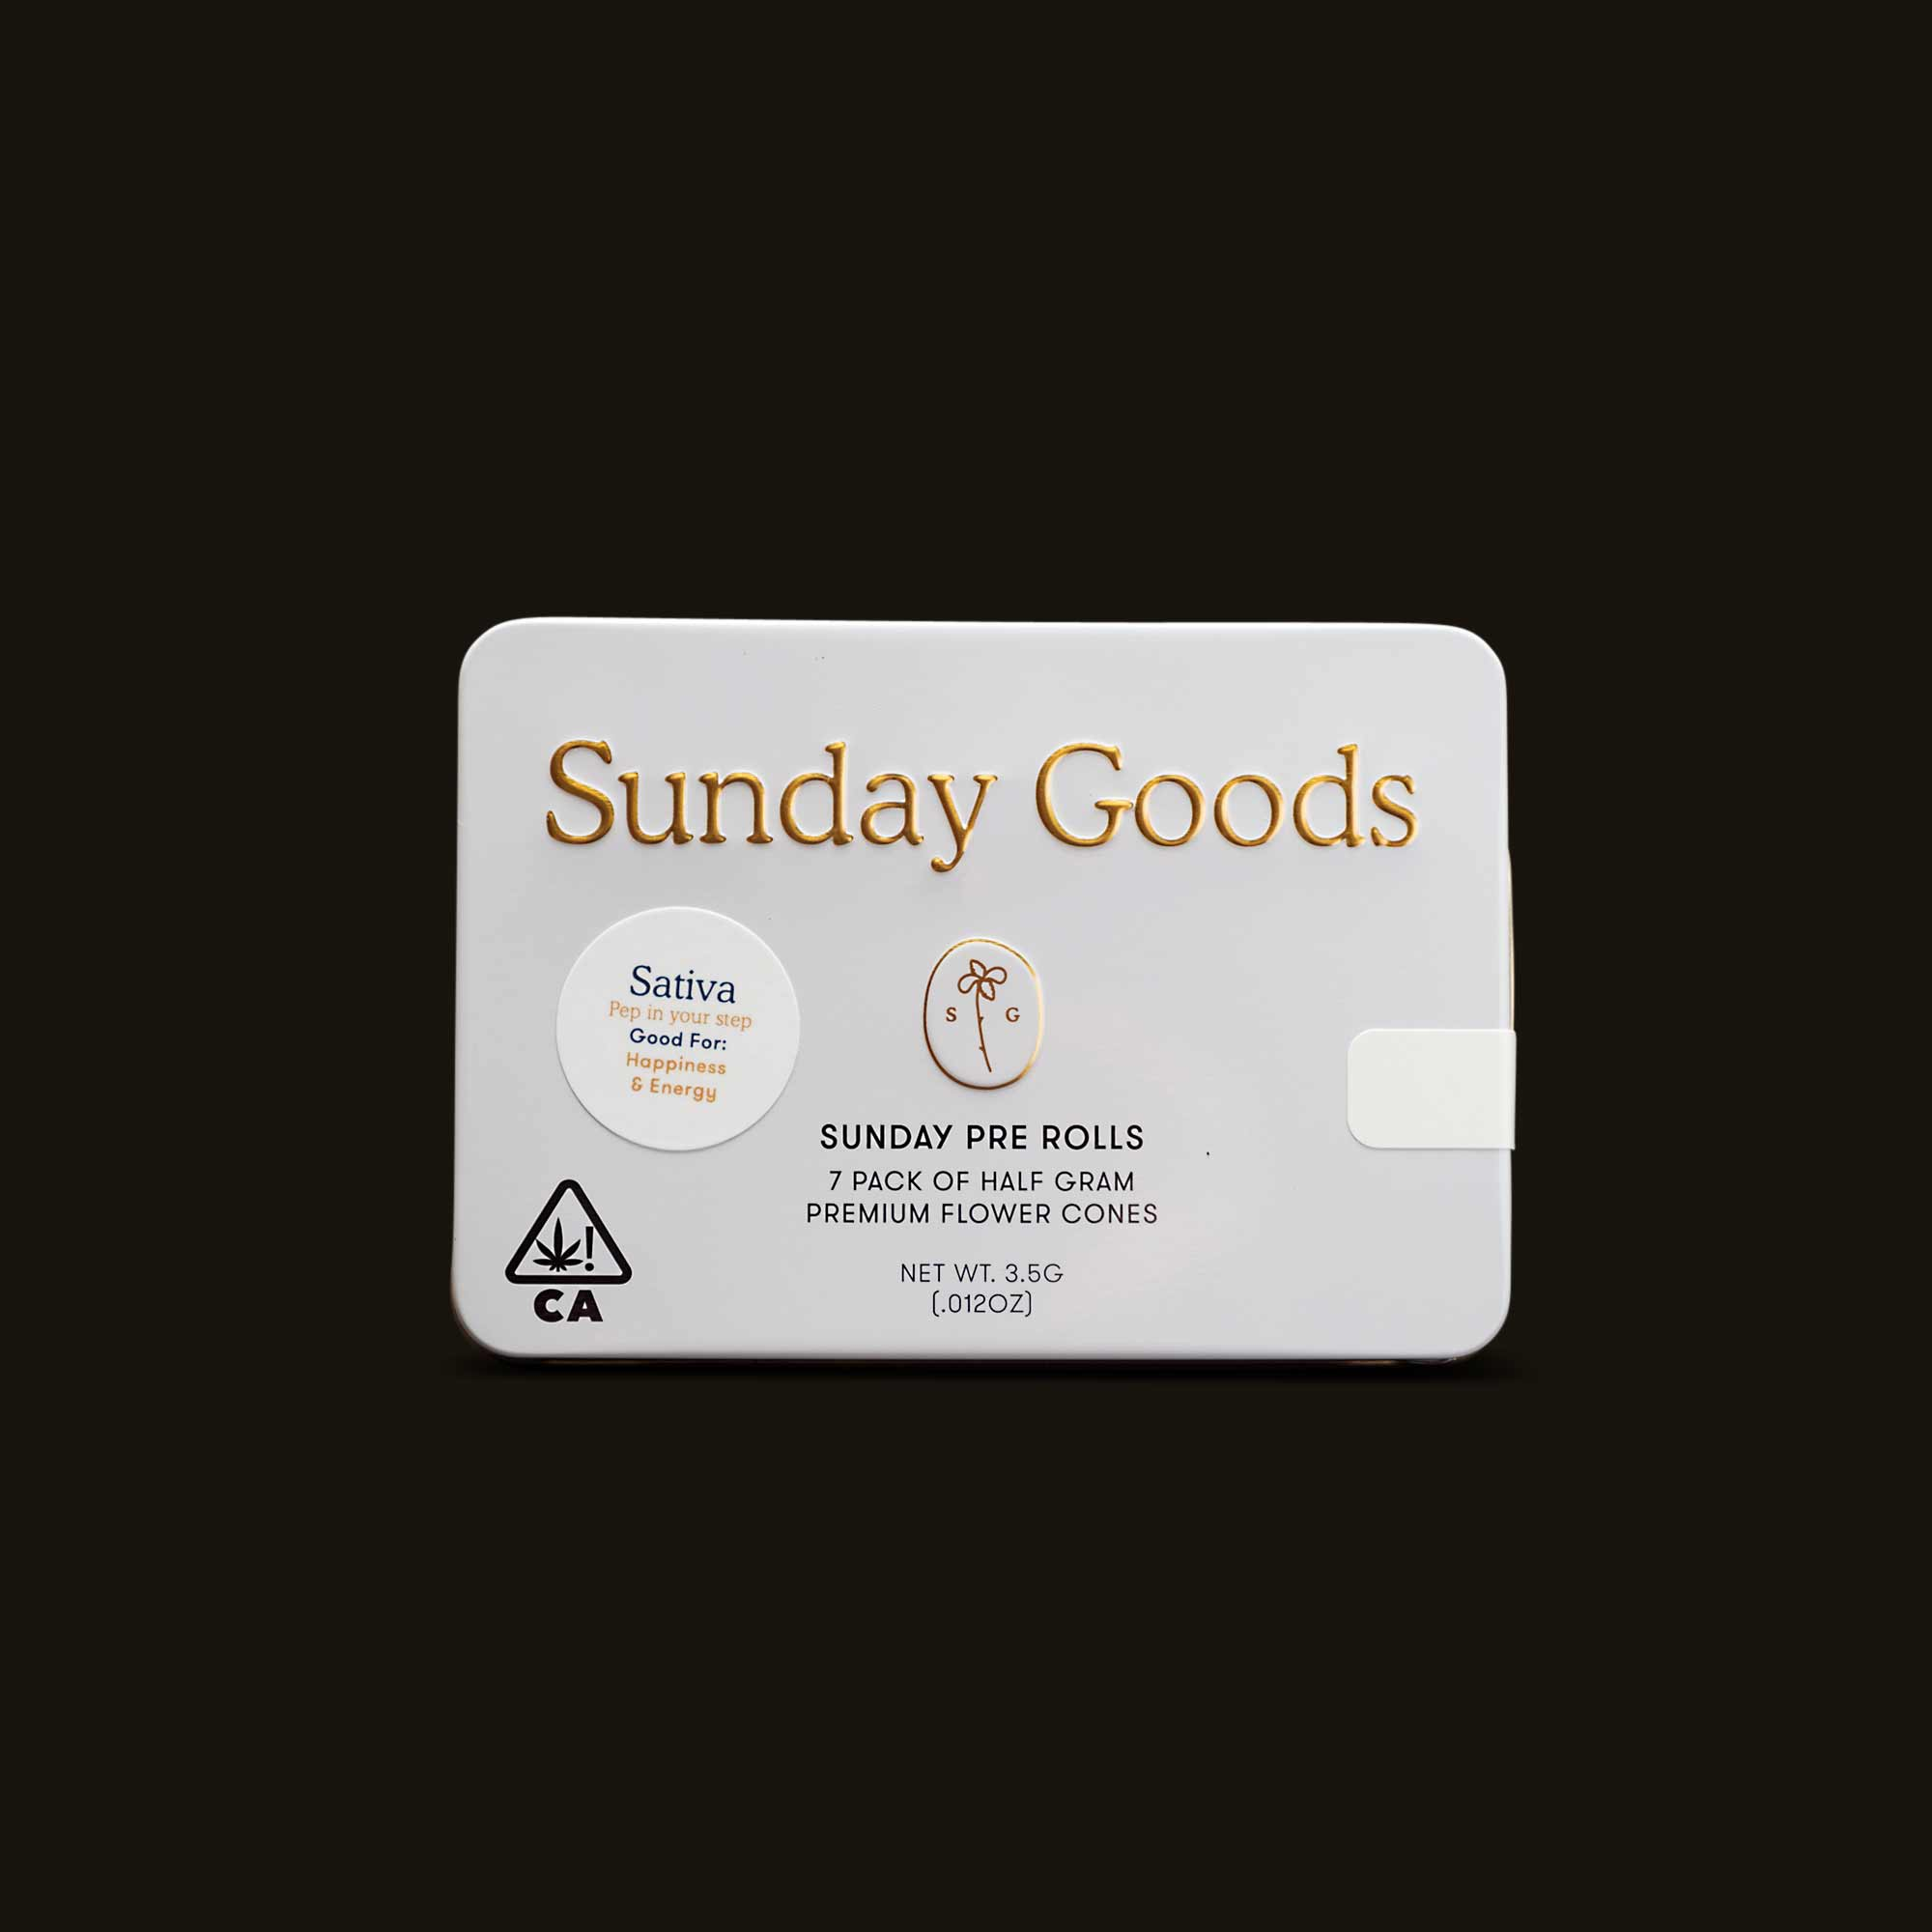 Sunday Goods Sativa Blend Pack